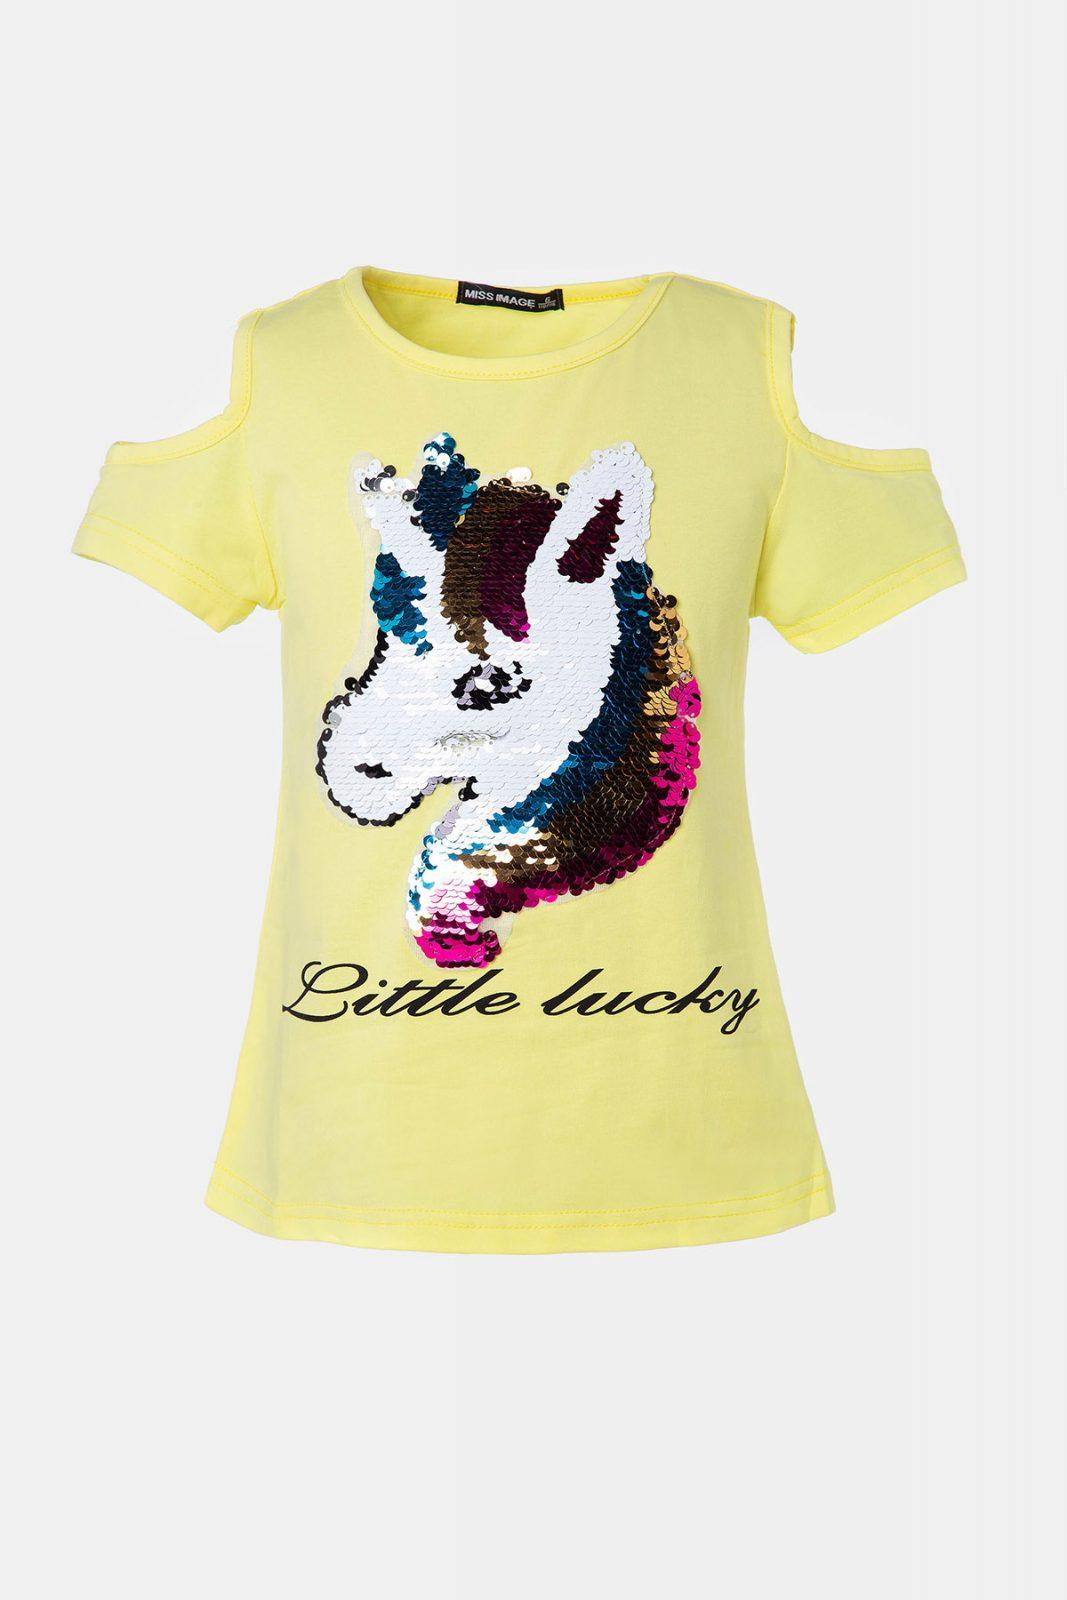 f3f75d0b438 Παιδική μπλούζα μονόκερος